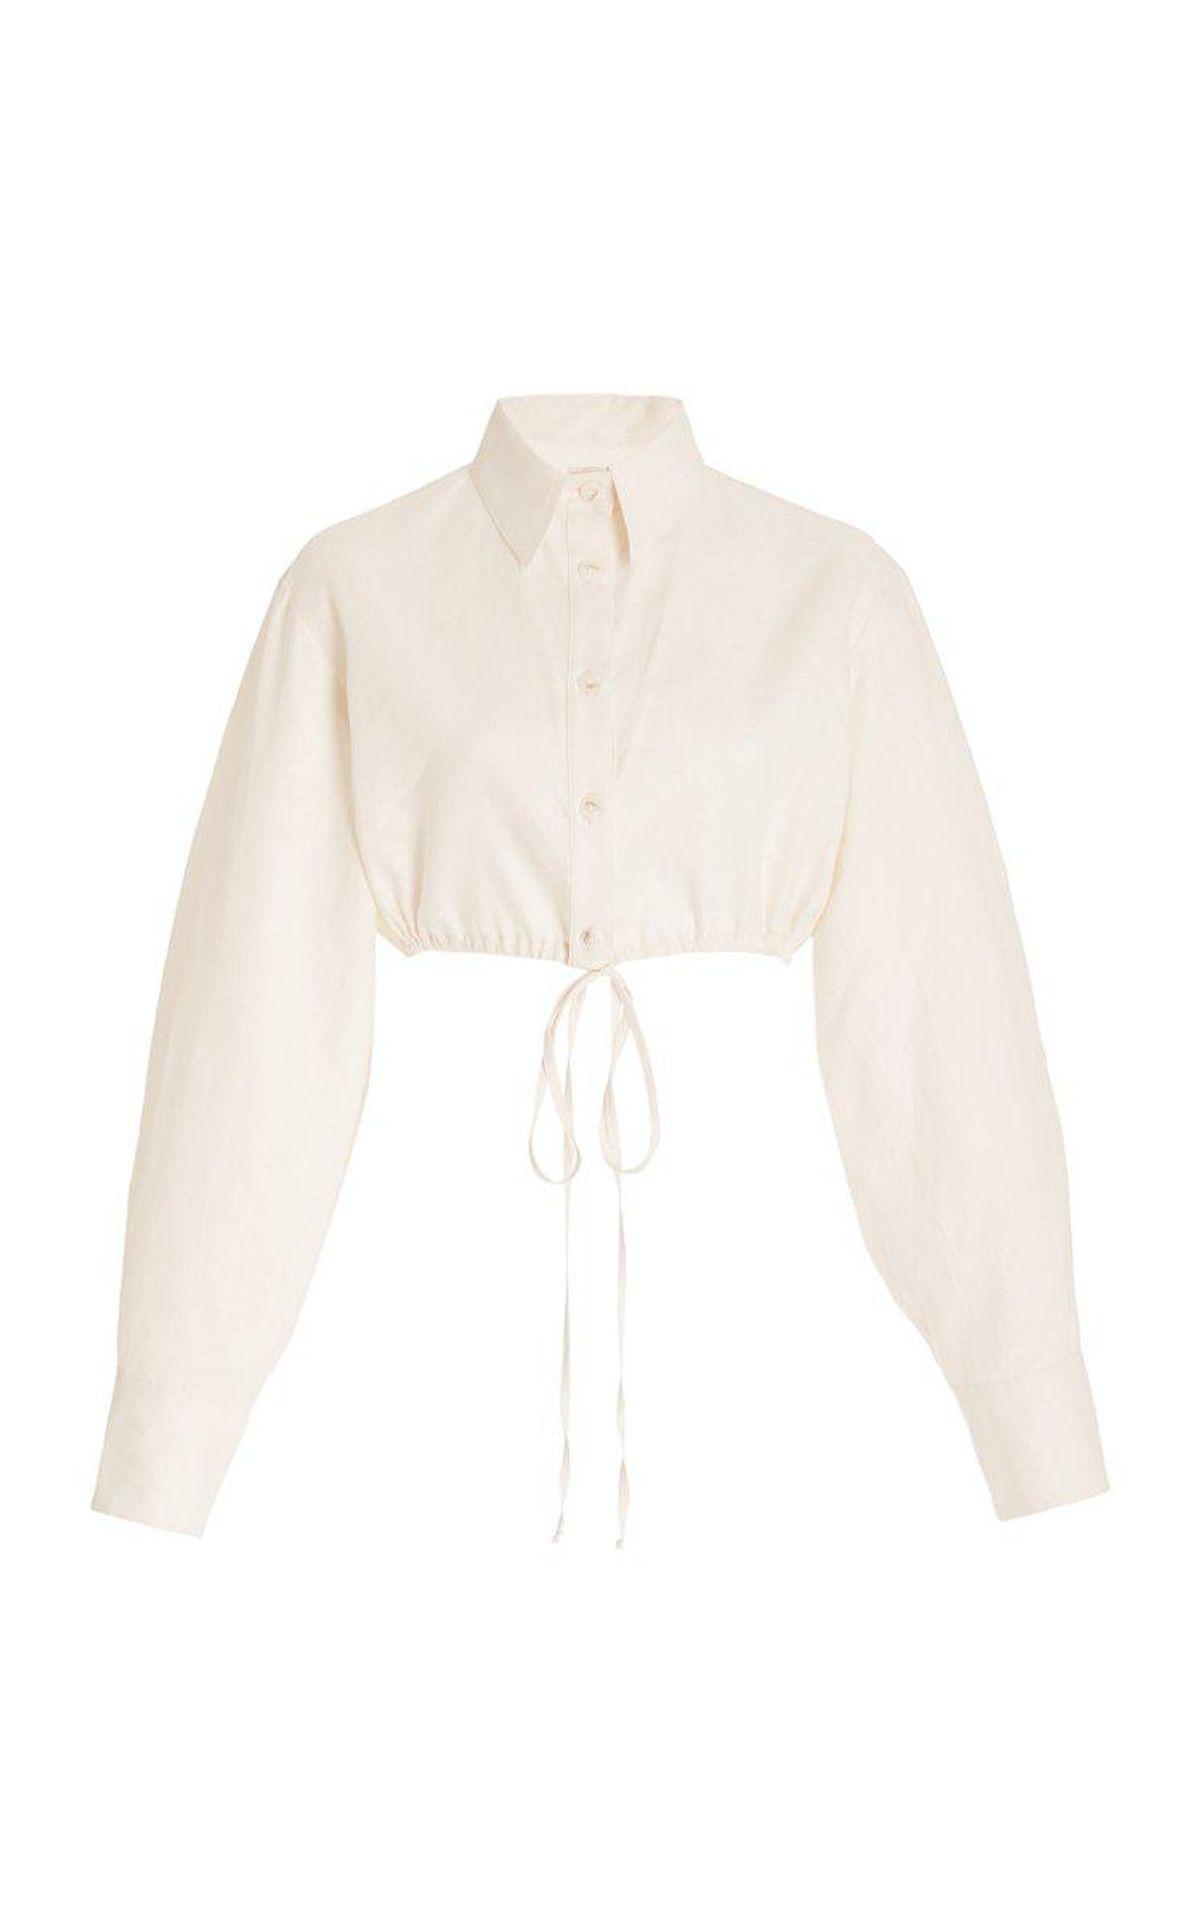 matthew burch exclusive cropped linen shirt